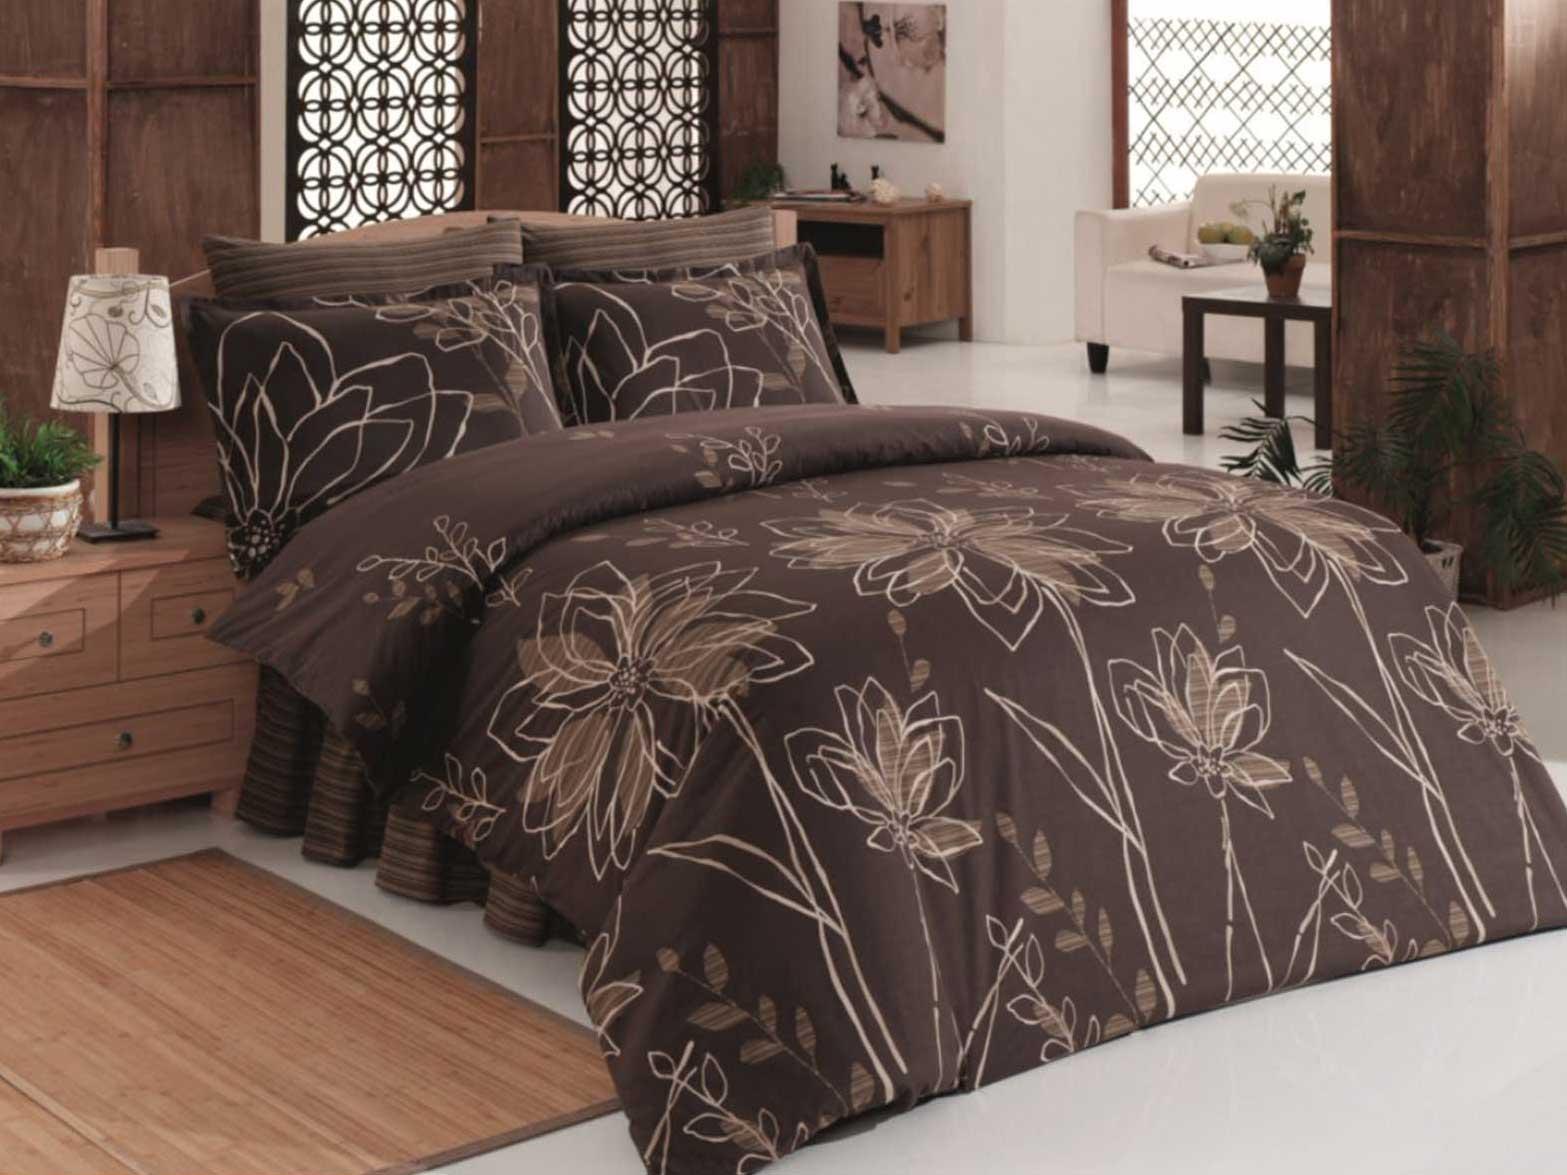 5 tlg bettw sche bettgarnitur 100 baumwolle kissen 200x200cm krizantem 02 neu ebay. Black Bedroom Furniture Sets. Home Design Ideas